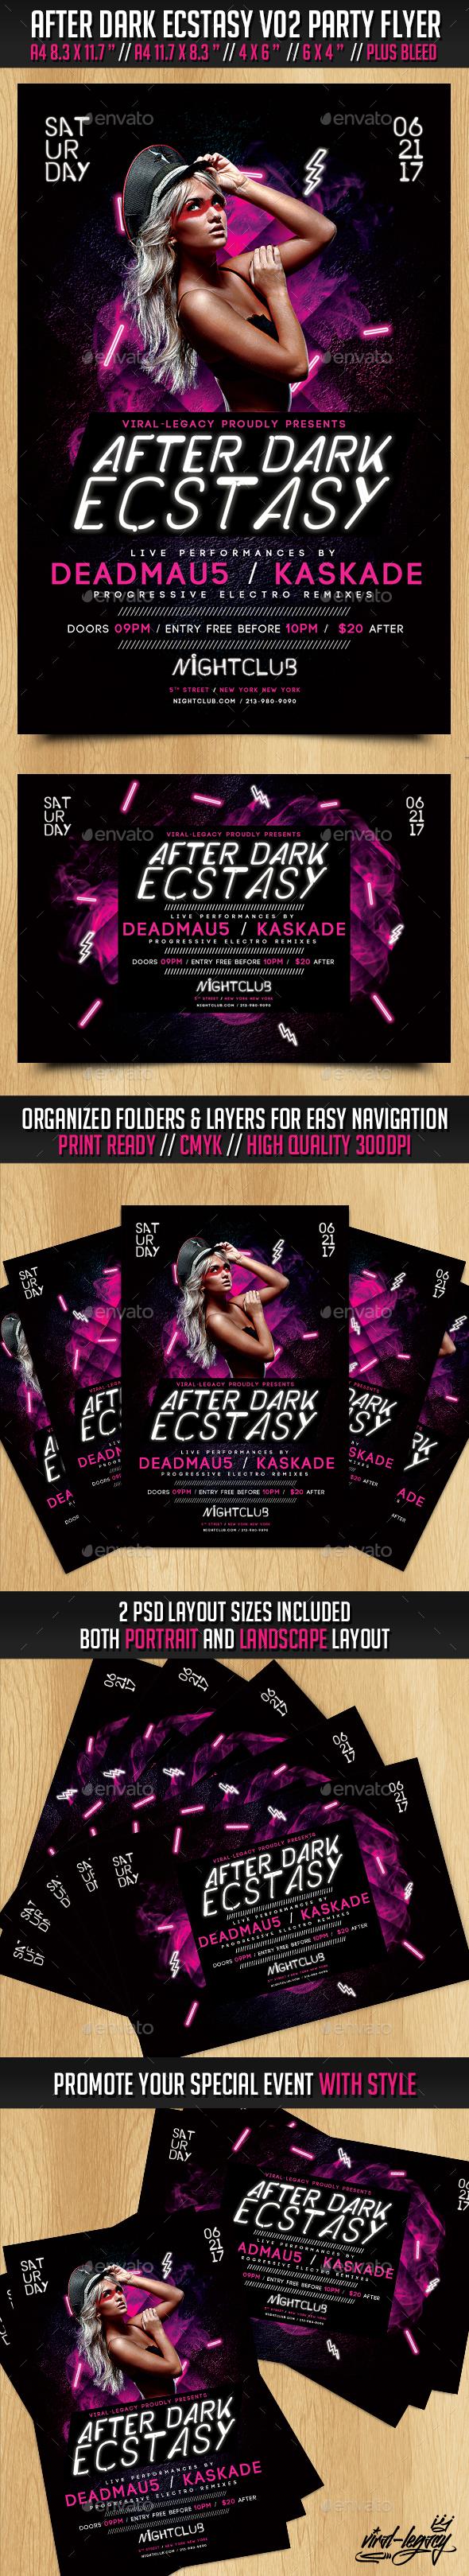 After Dark Ecstasy Volume 02 - Events Flyers